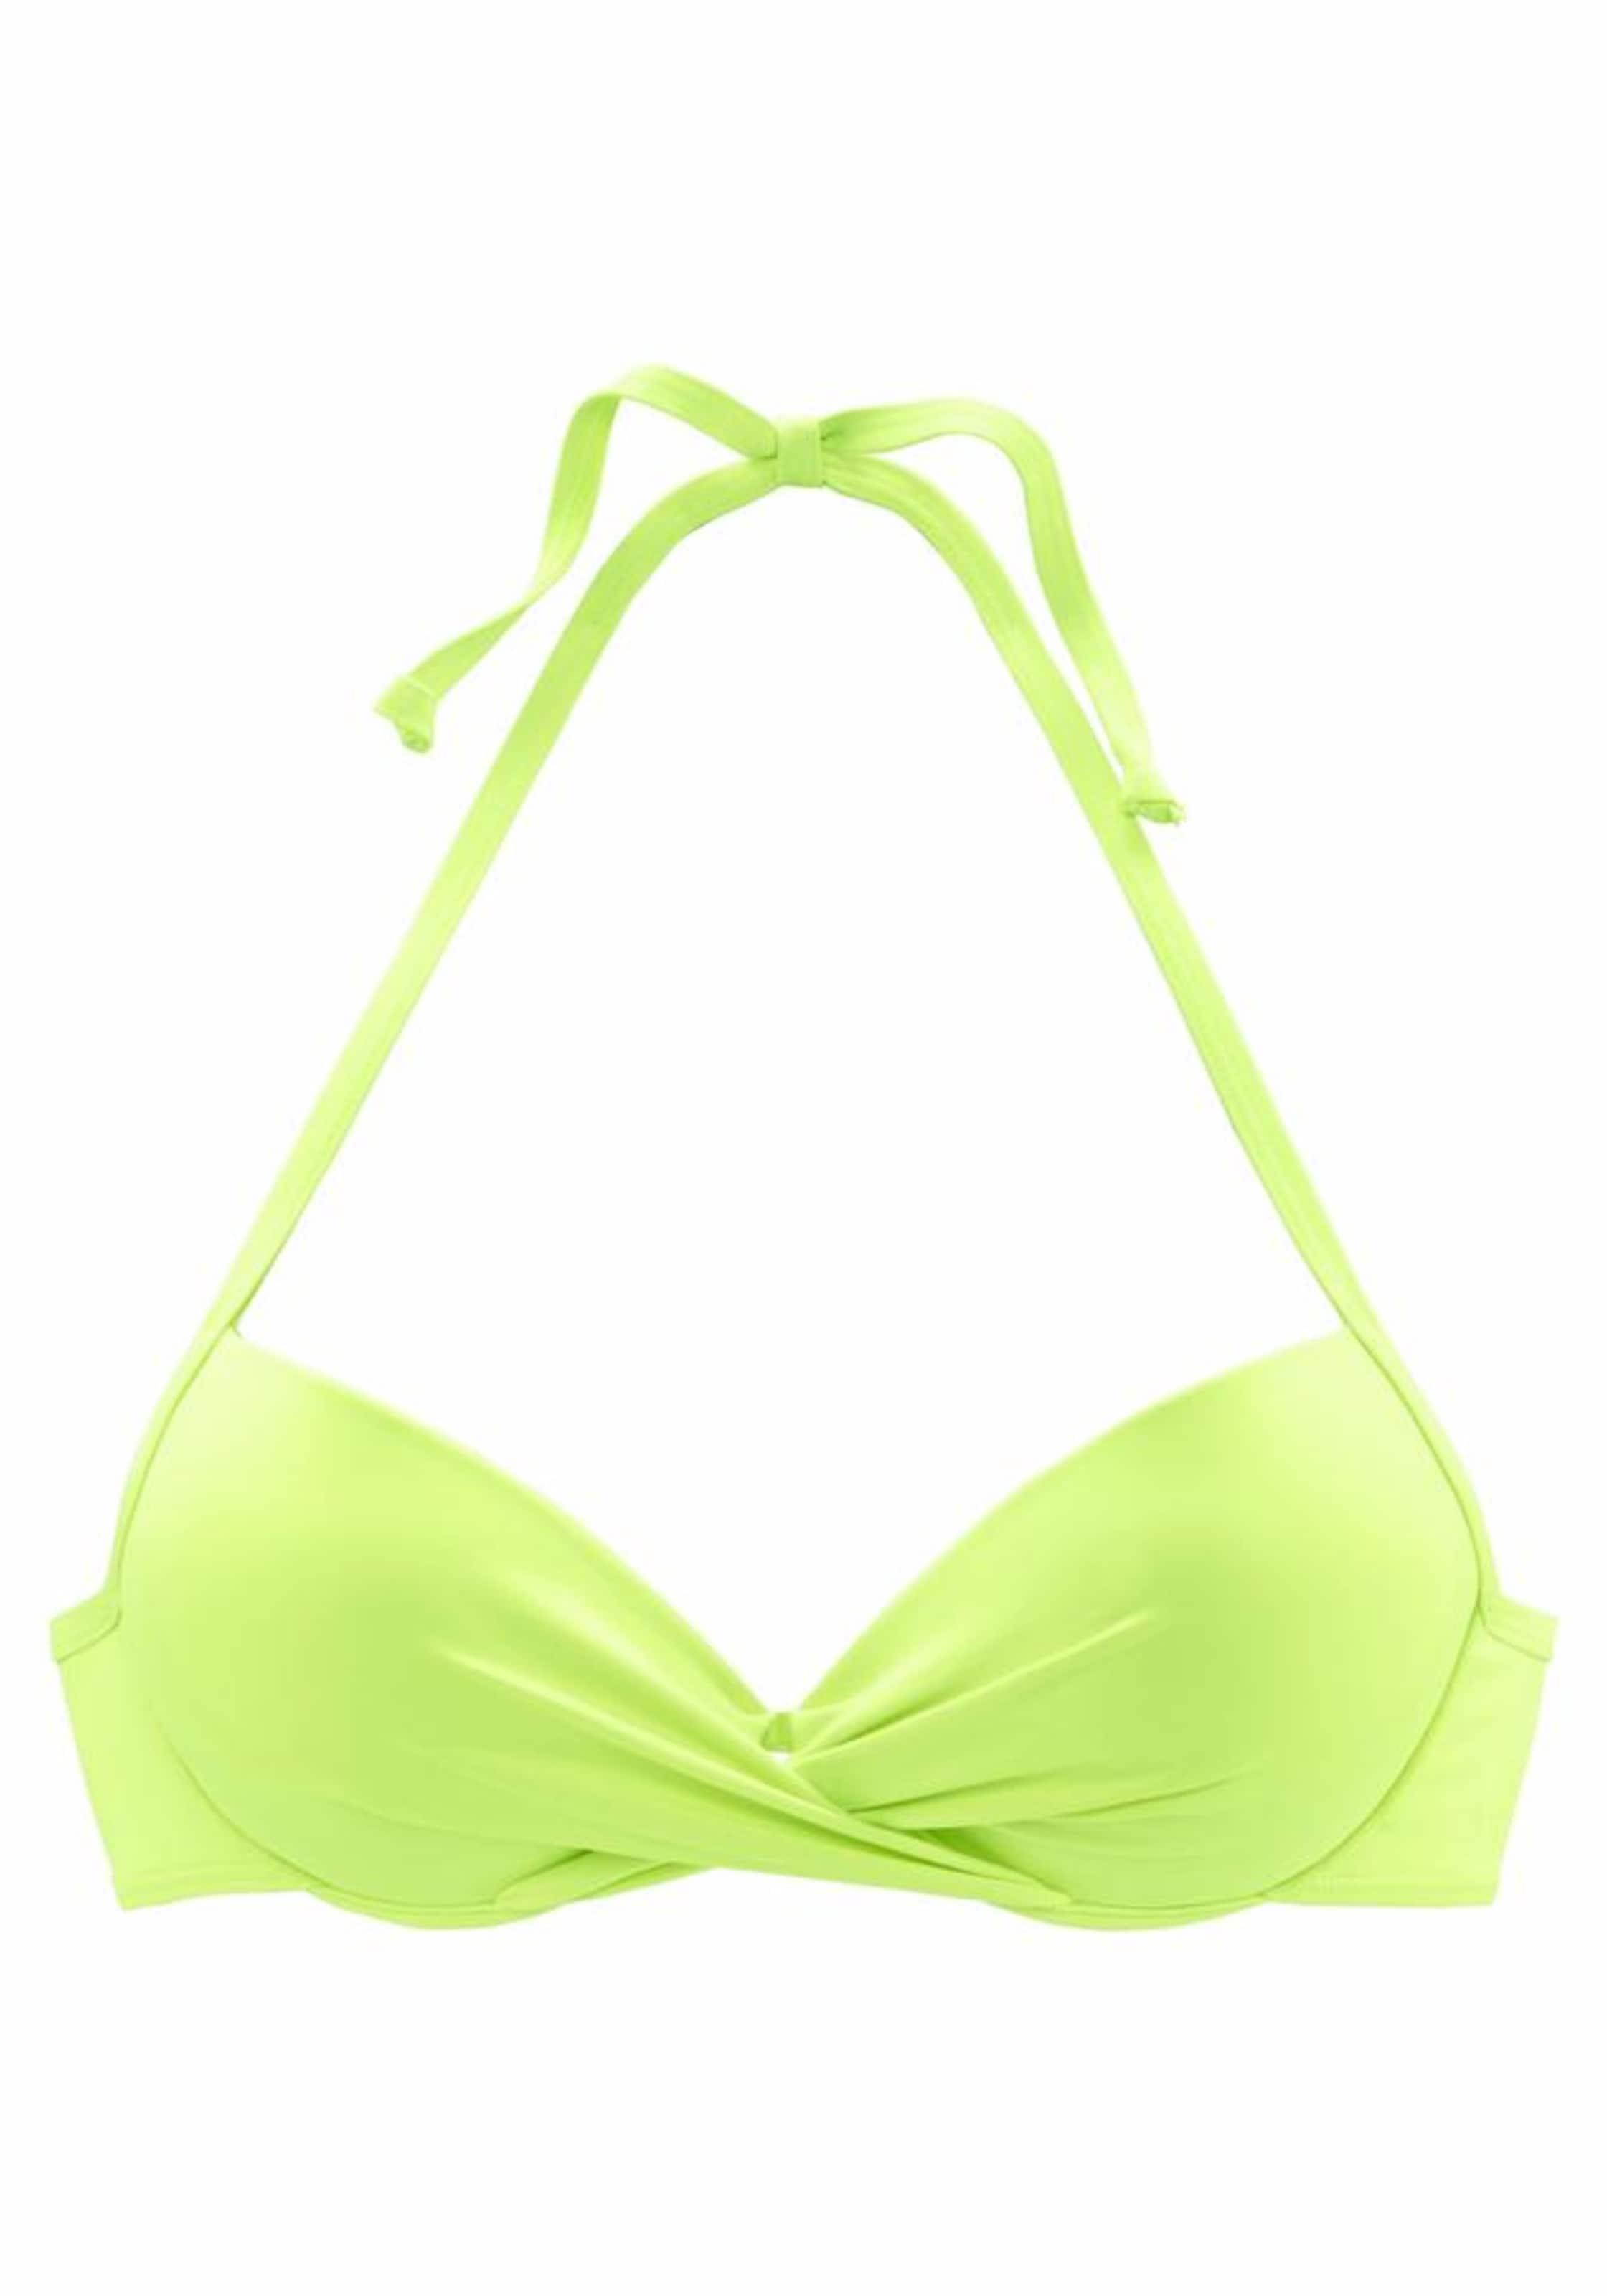 S In oliver Red Label 'spain' Beachwear Bikinitop Limette IYf6gb7yv